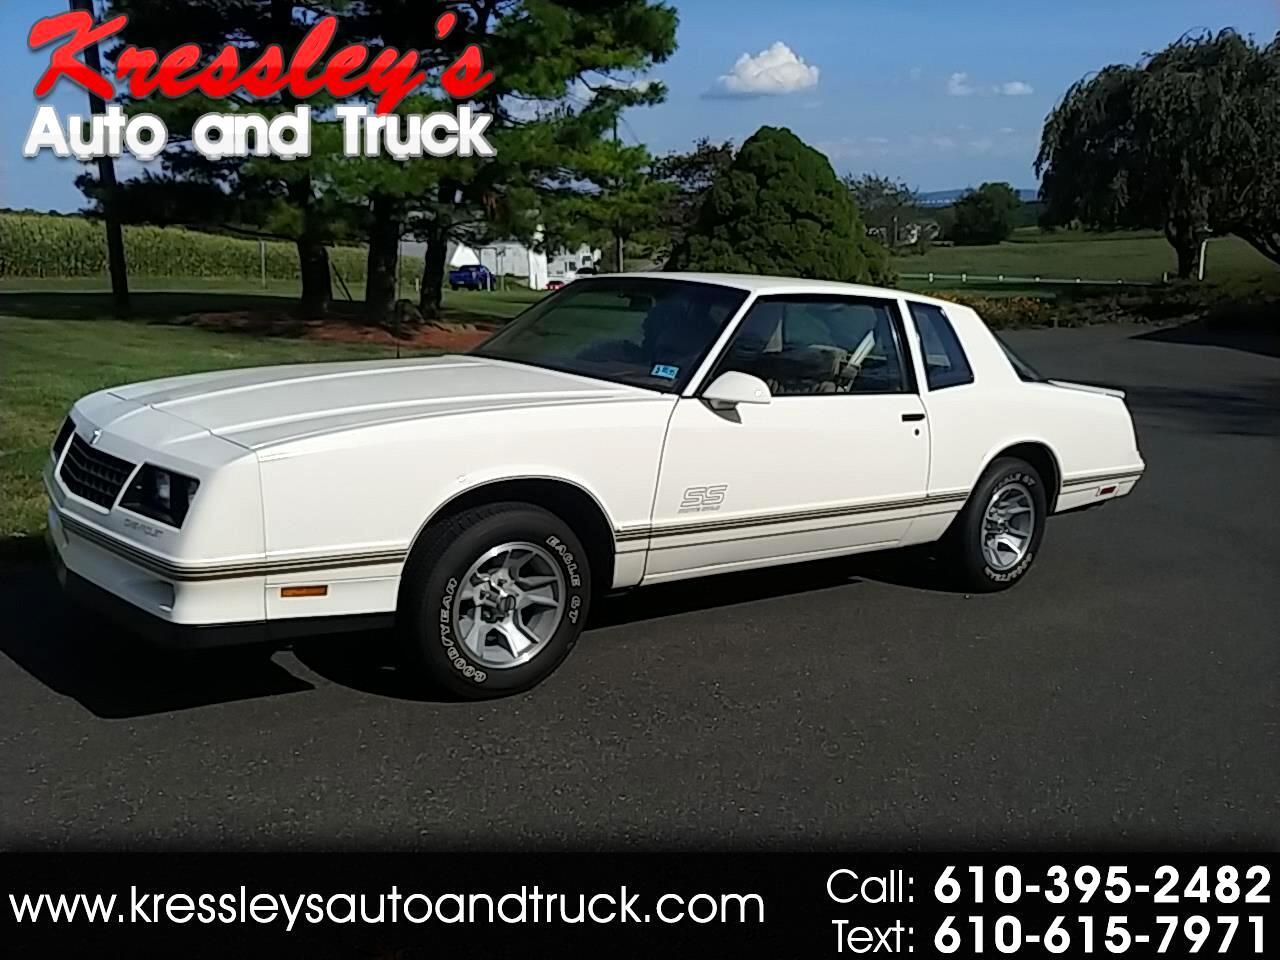 1987 Chevrolet Monte Carlo 2dr Coupe Aero SS